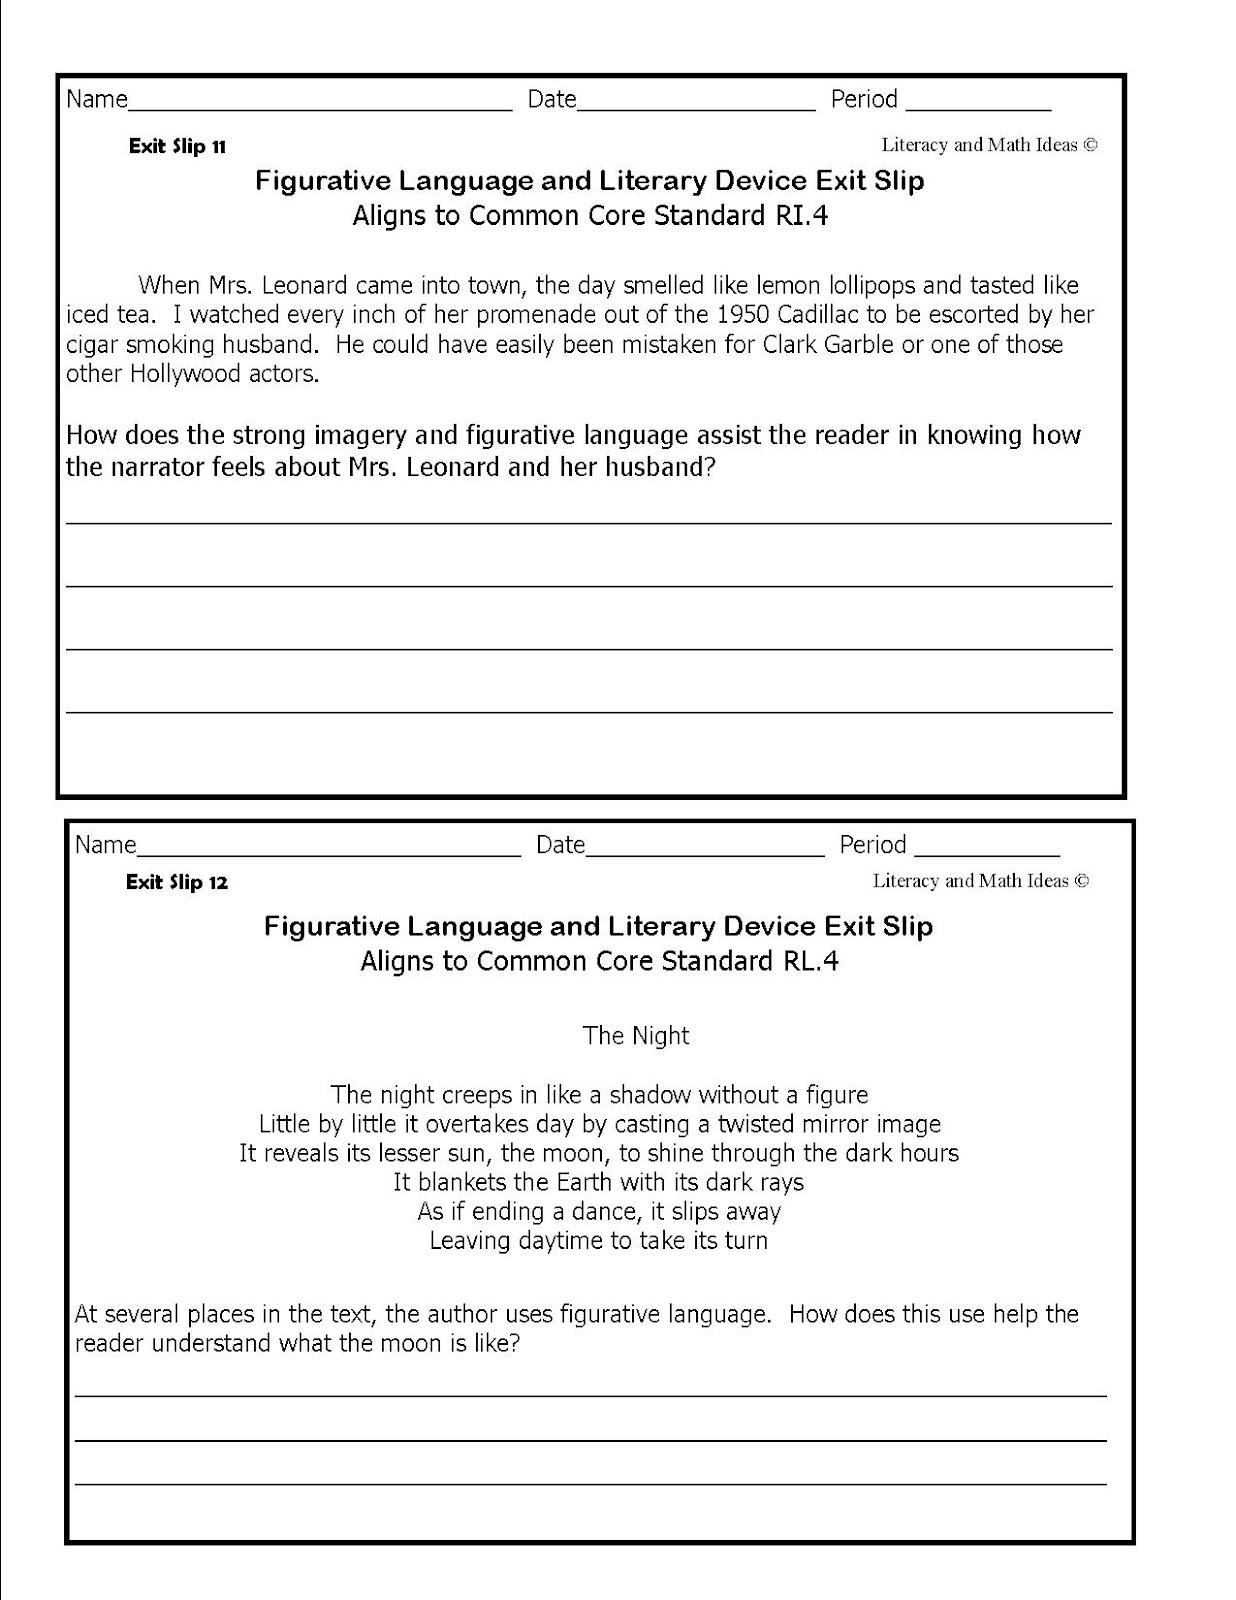 Literacy Amp Math Ideas Figurative Language Exit Slips